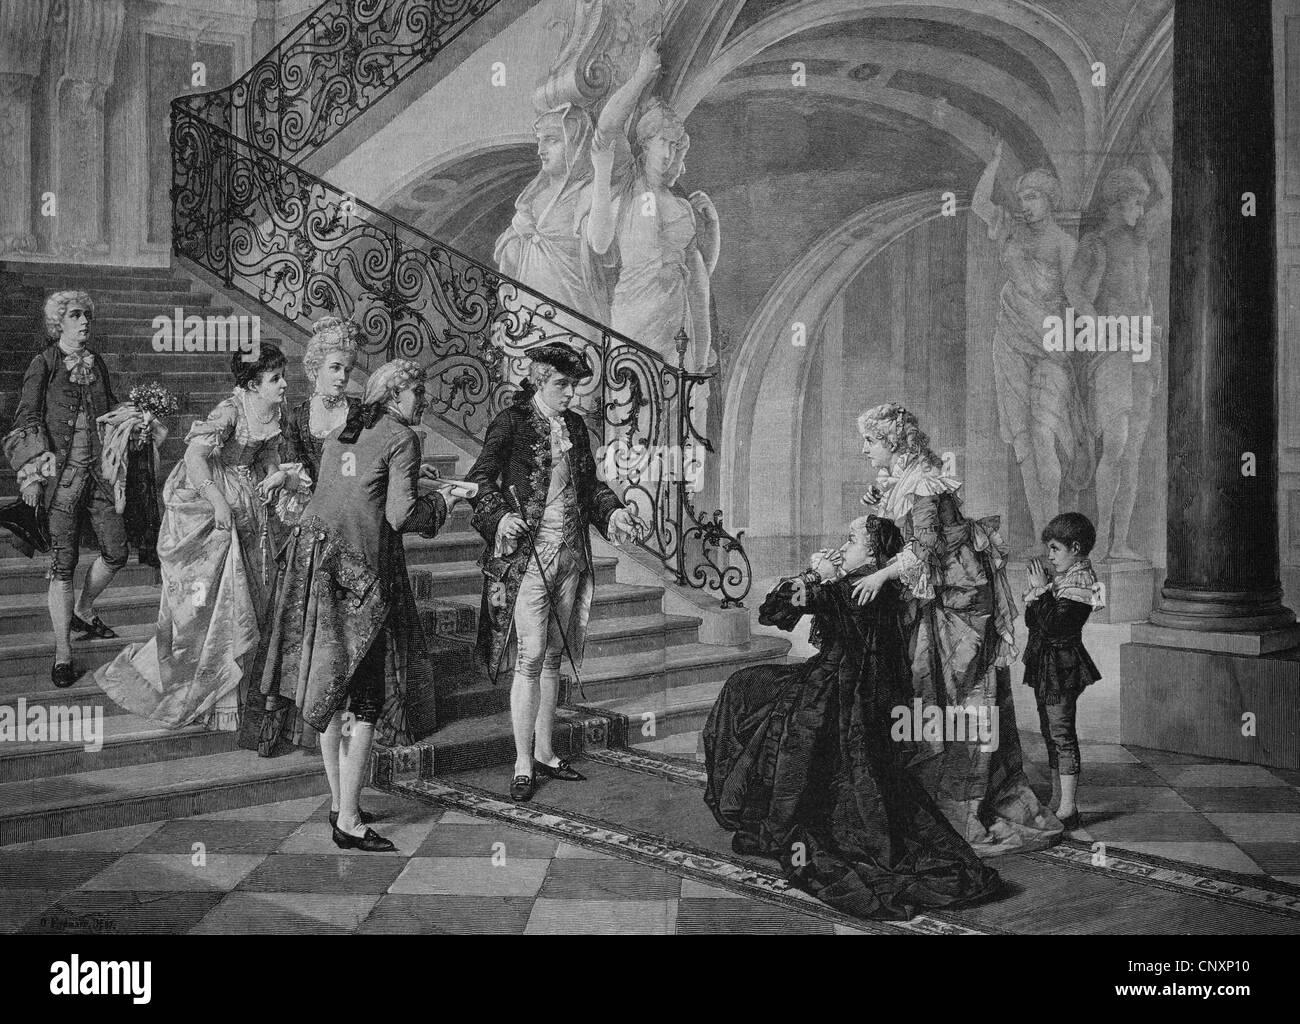 Clemency, historical engraving, circa 1885 - Stock Image